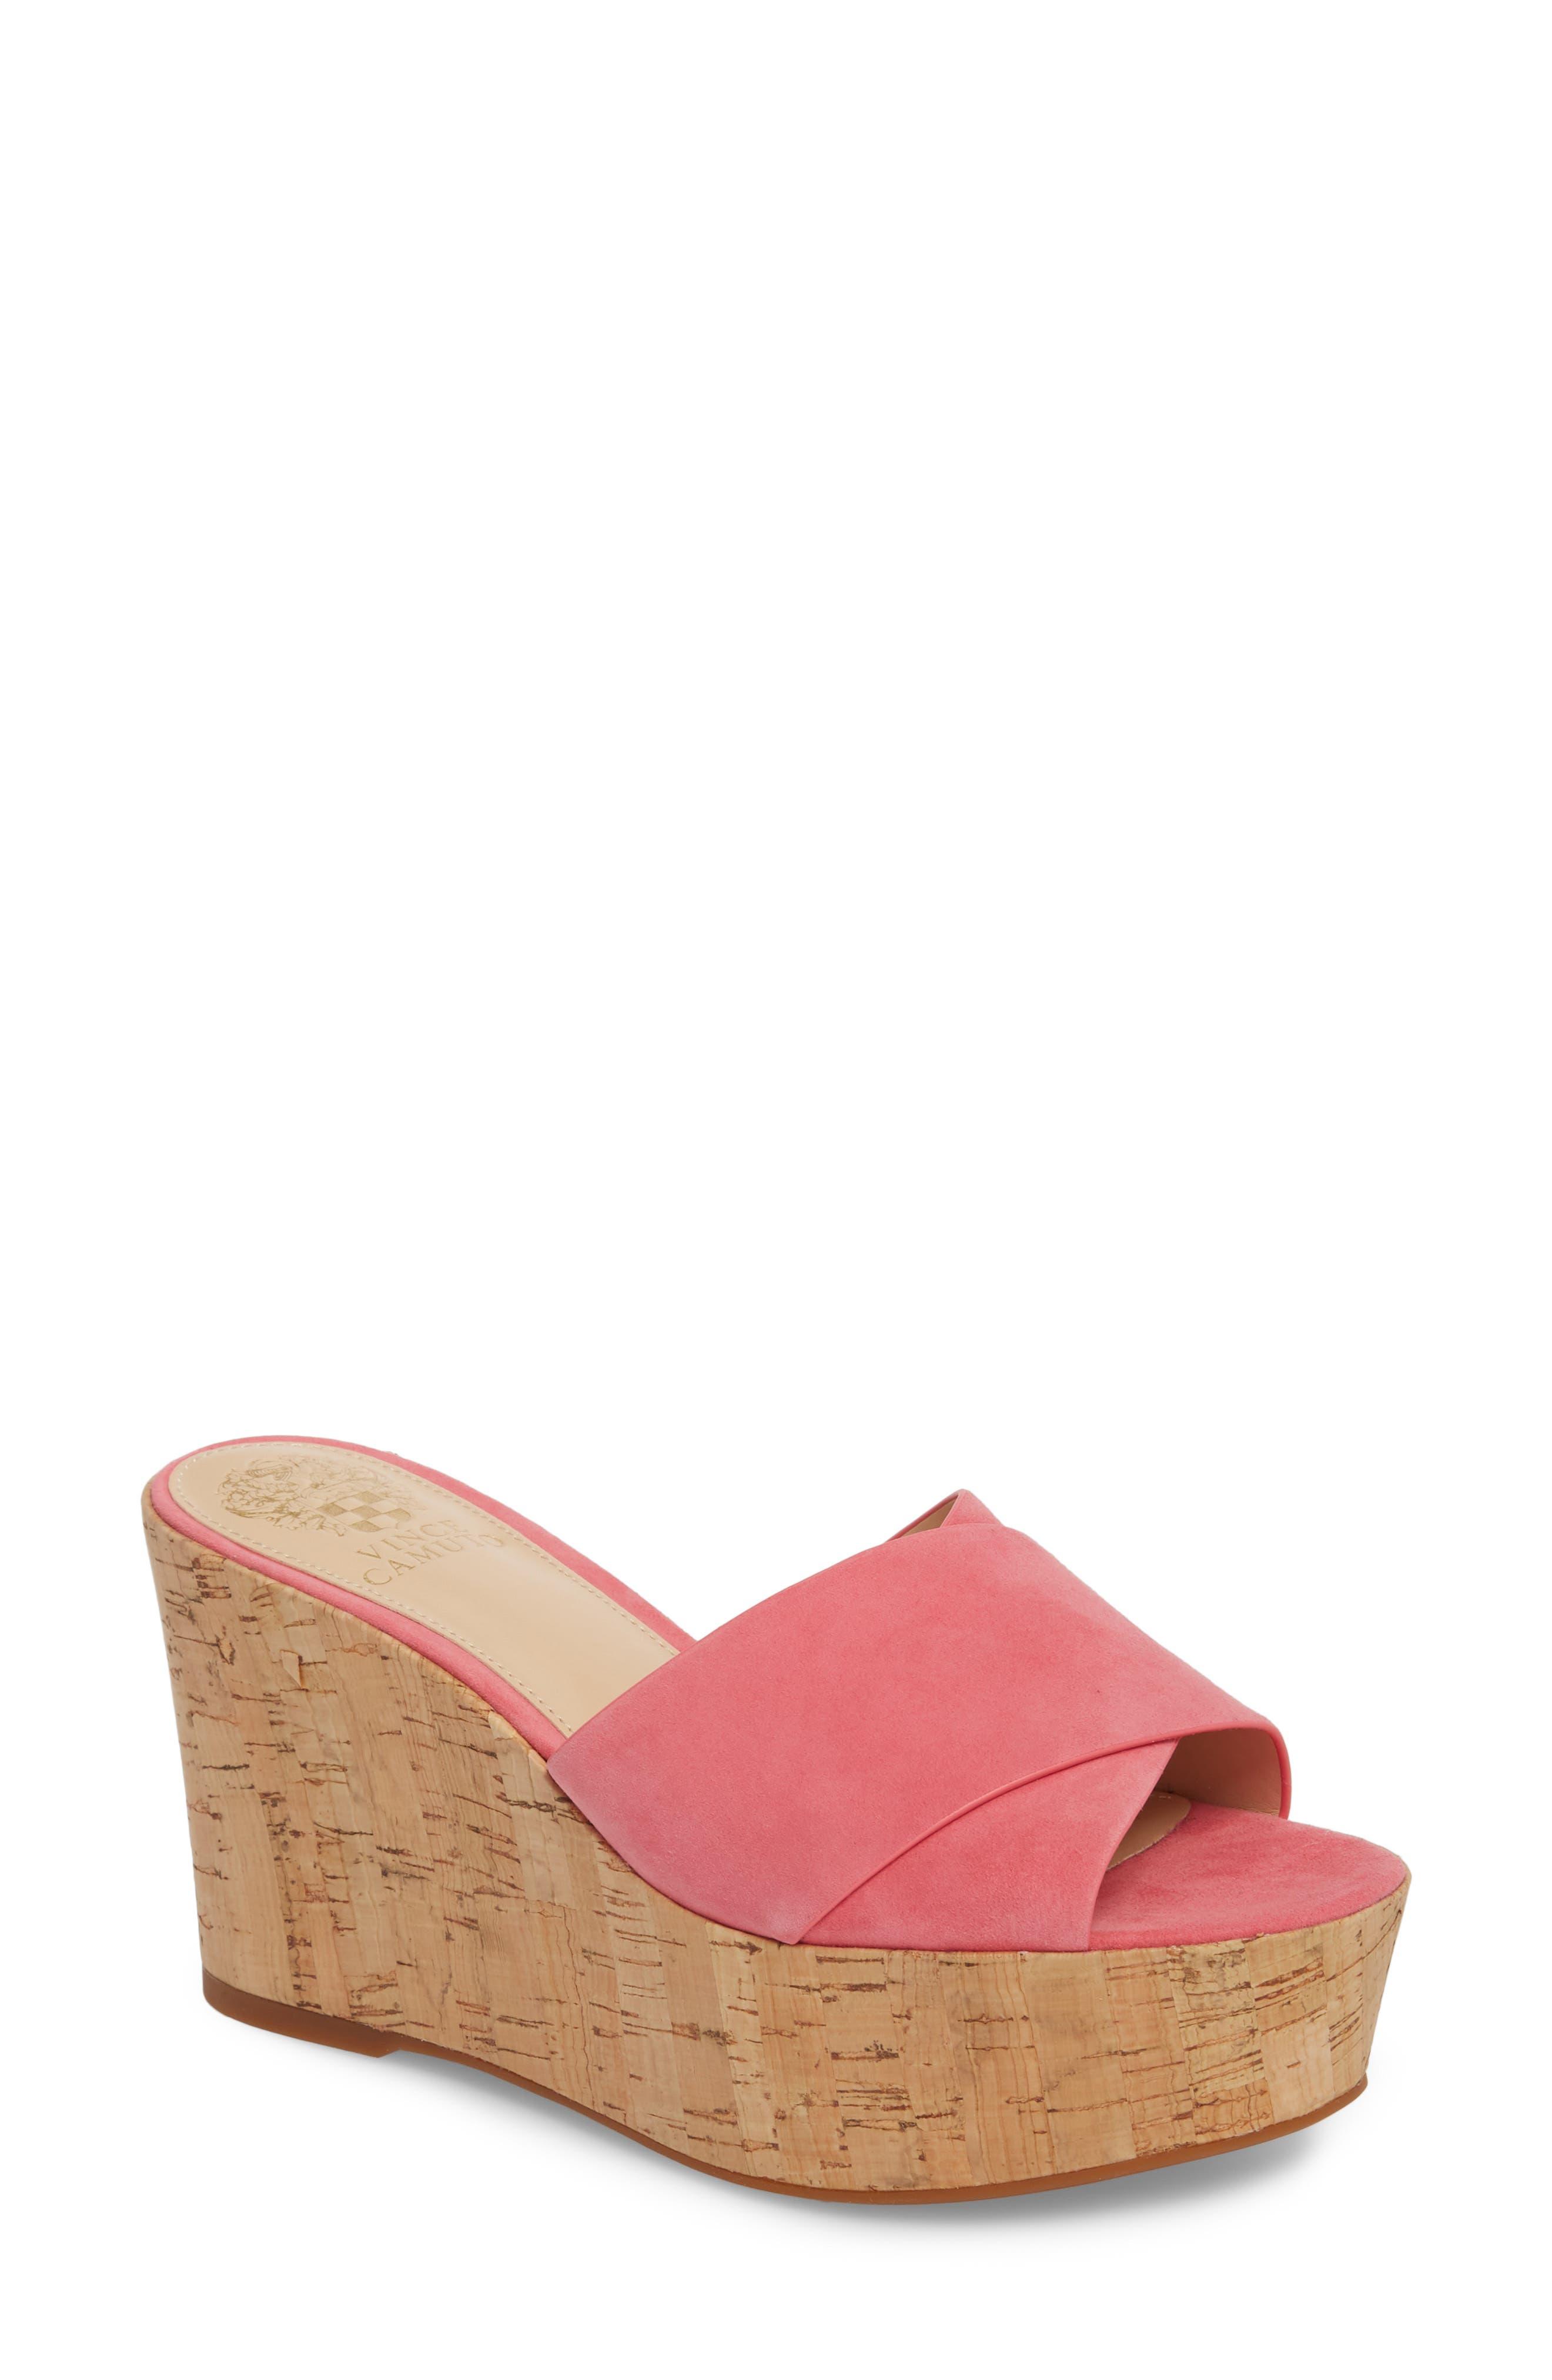 Kessina Platform Wedge Mule,                             Main thumbnail 1, color,                             Soft Pink Suede